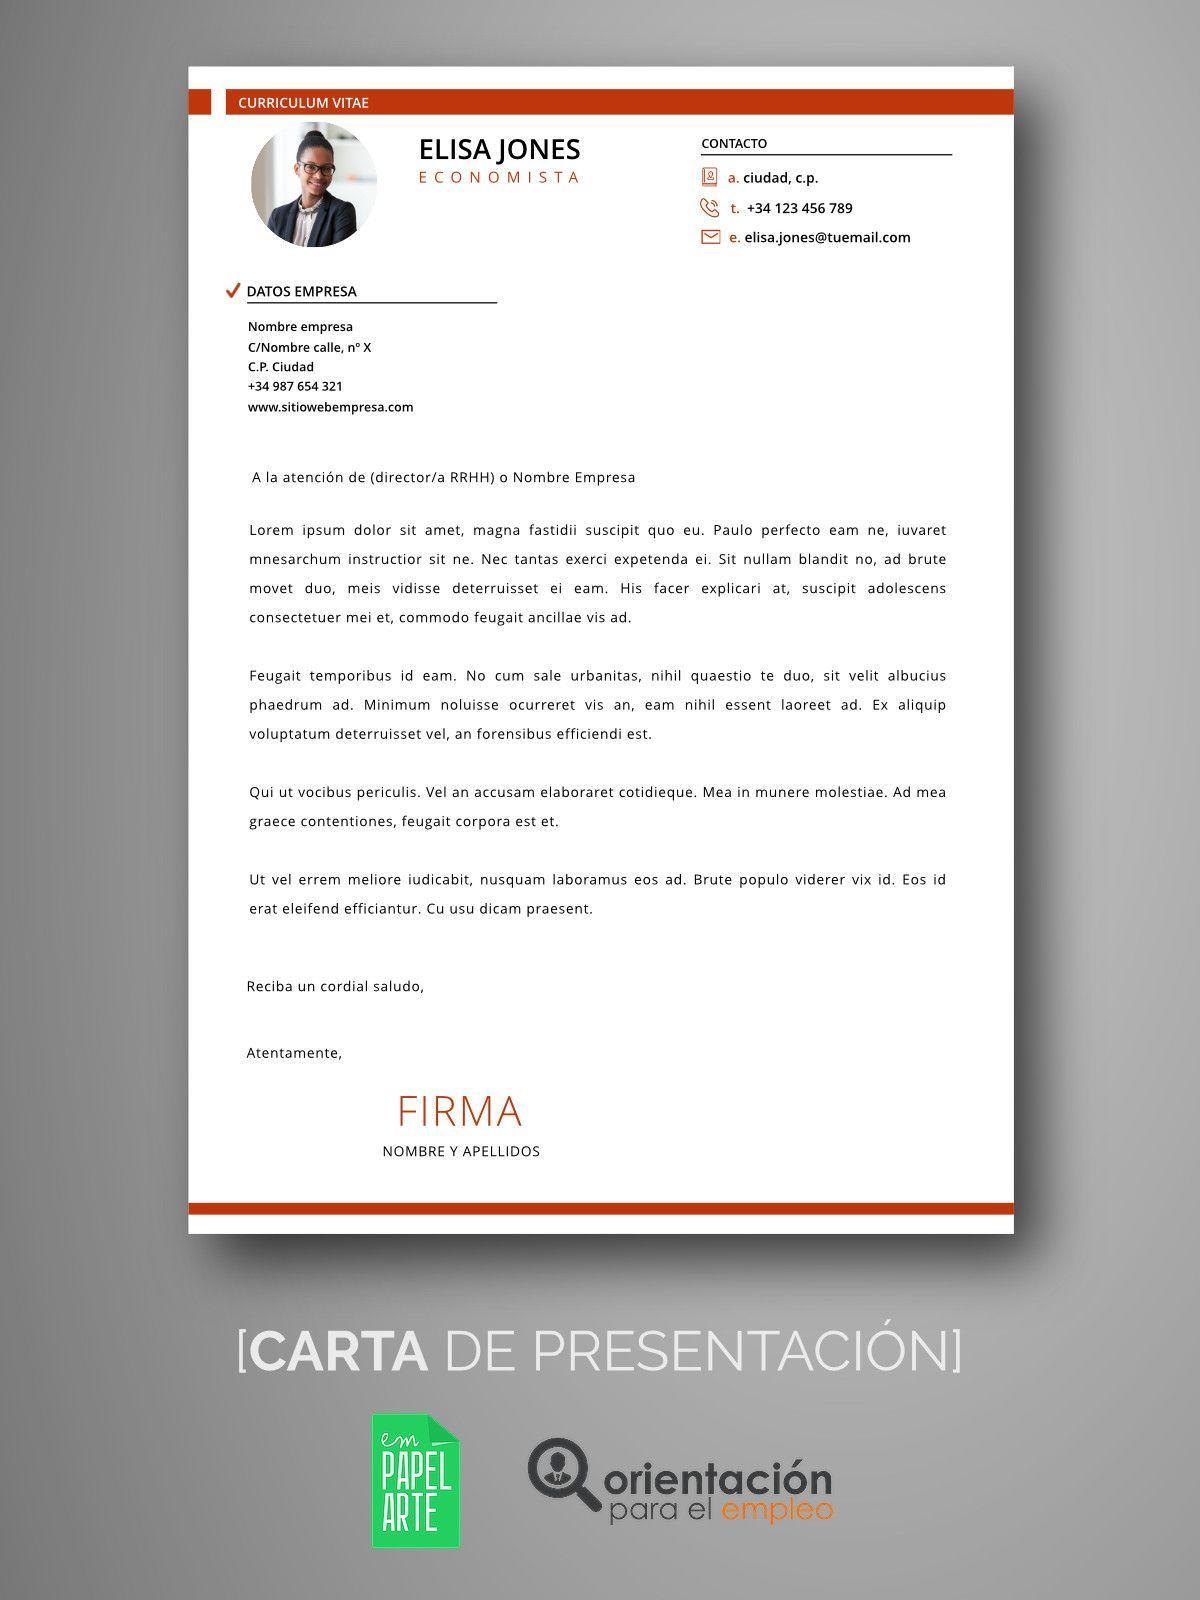 Excelente Entrada De Datos Reanudar Carta De Presentación Patrón ...